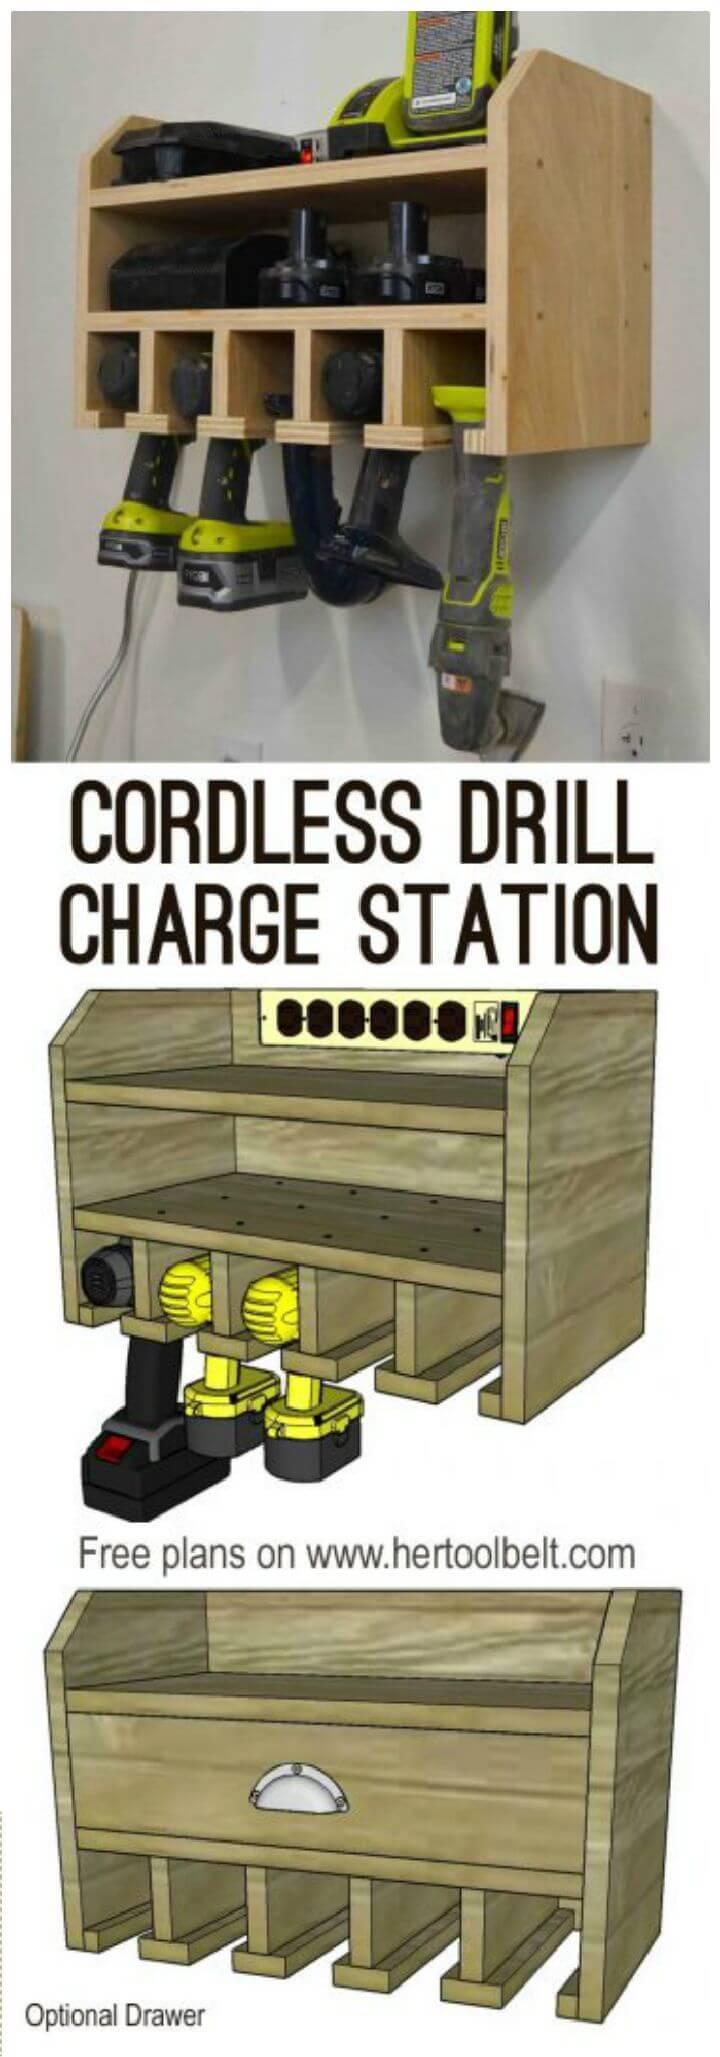 DIY Cordless Drill Storage Charging Station